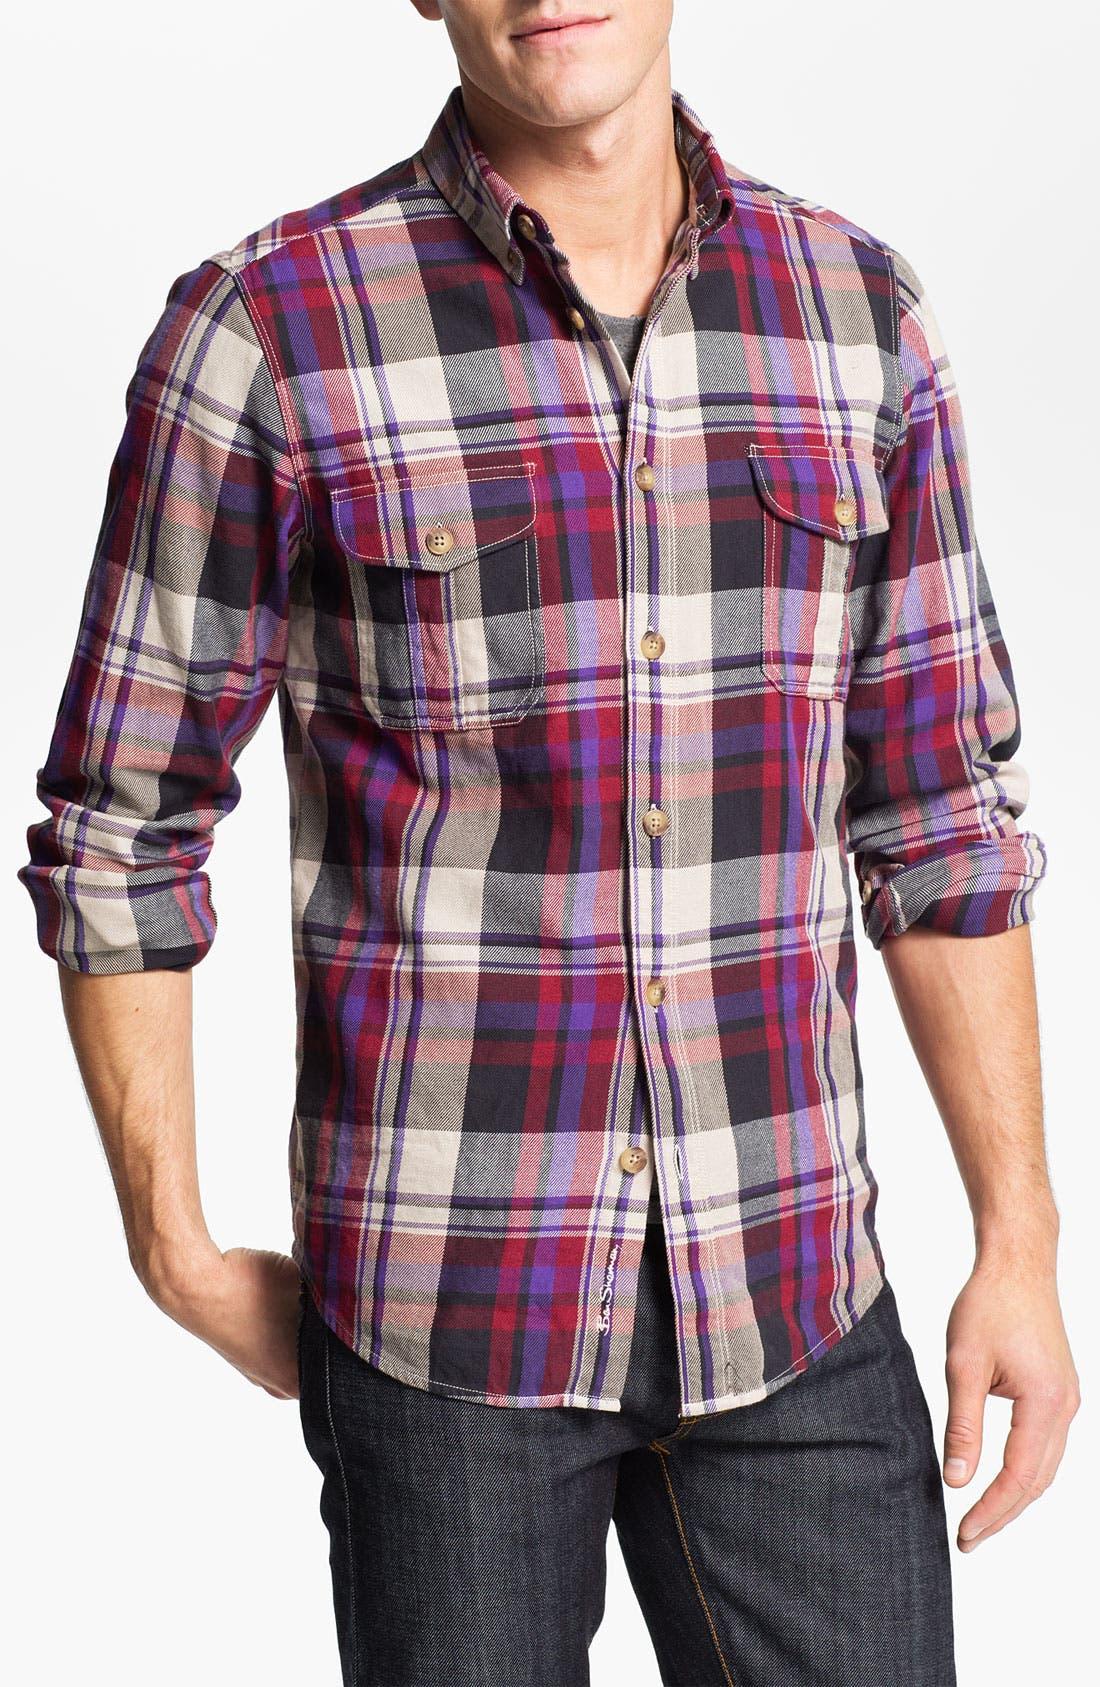 Alternate Image 1 Selected - Ben Sherman 'Clerkenwell' Plaid Flannel Shirt